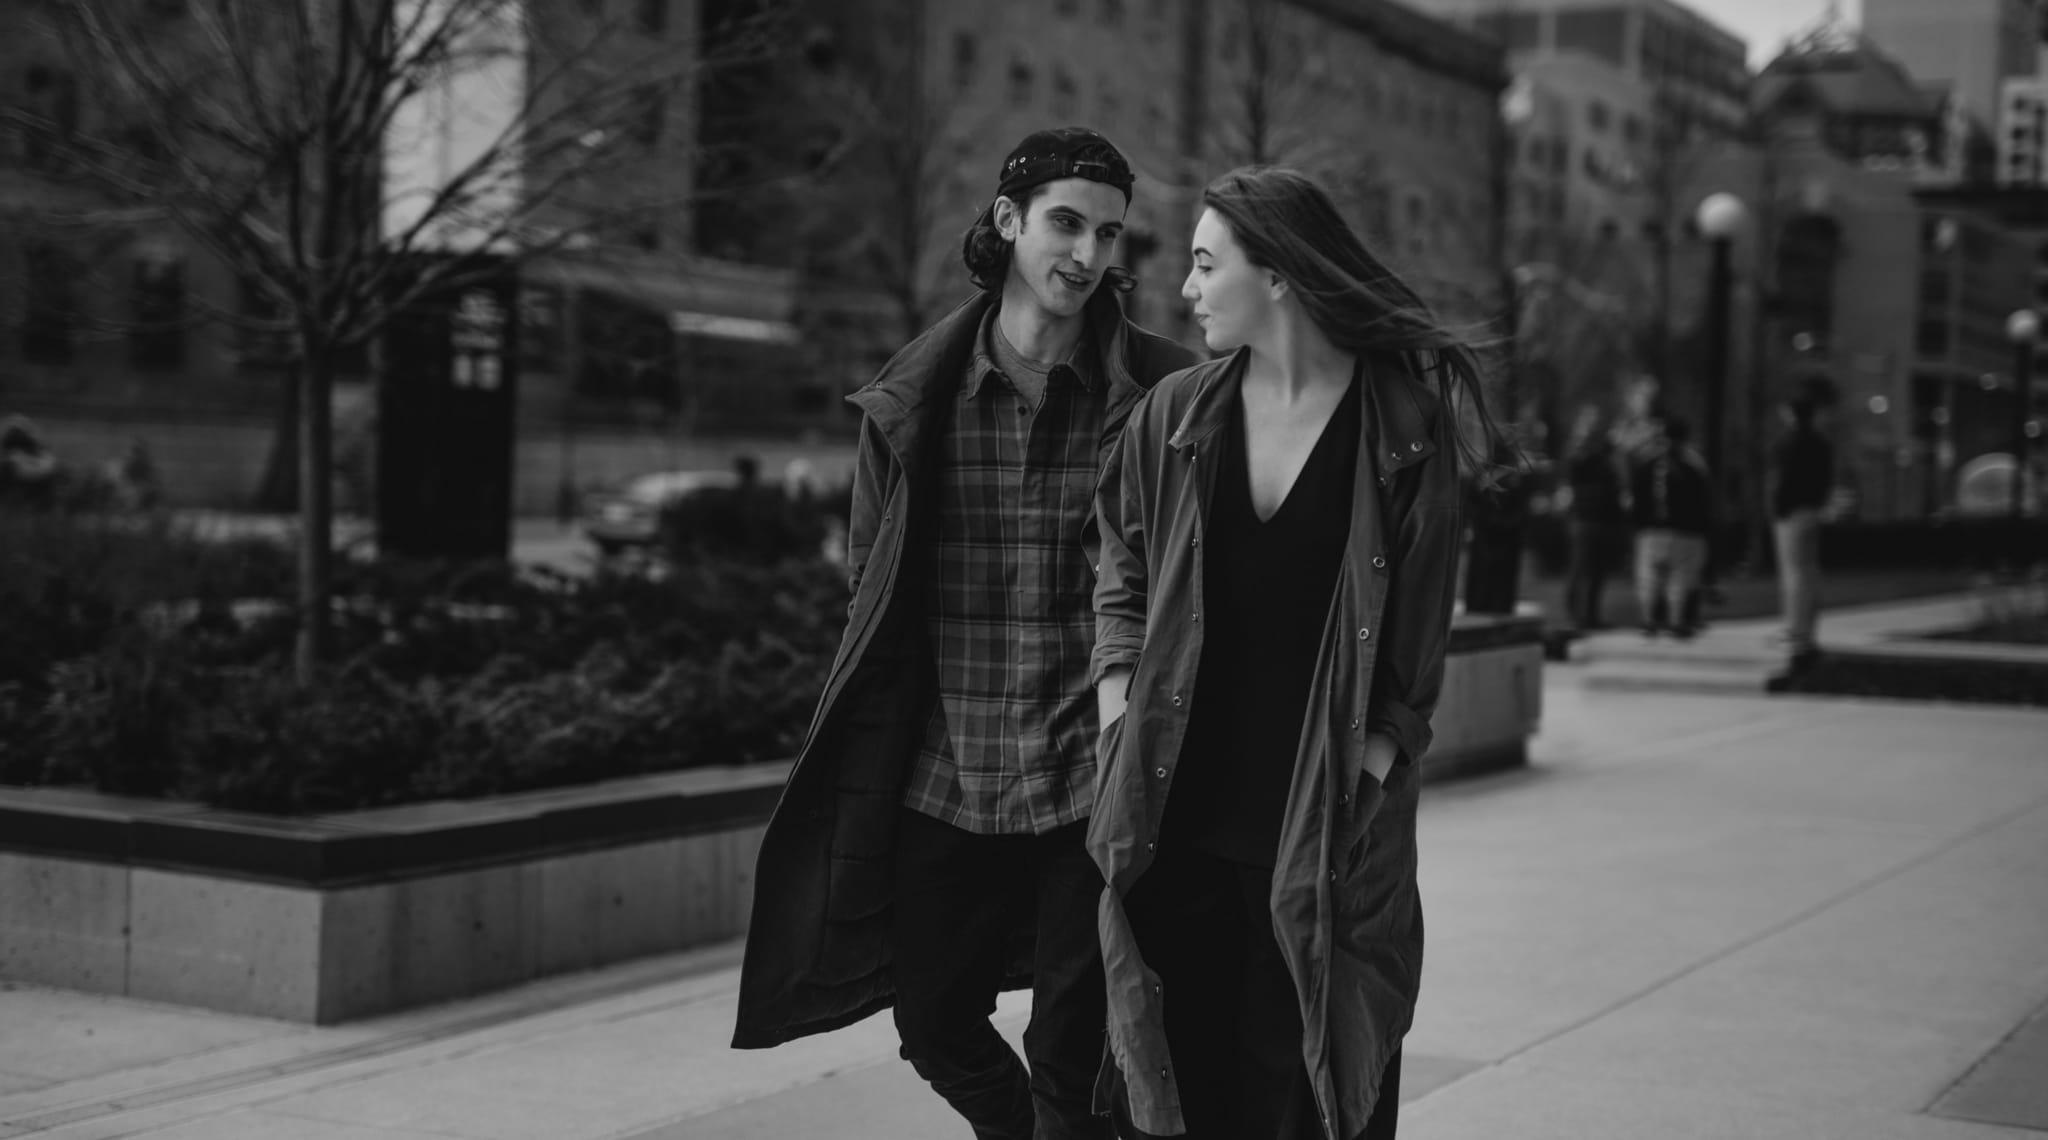 Emotional-Couple-Photography-Downtown-Toronto-Canada-Brjánn-Rya